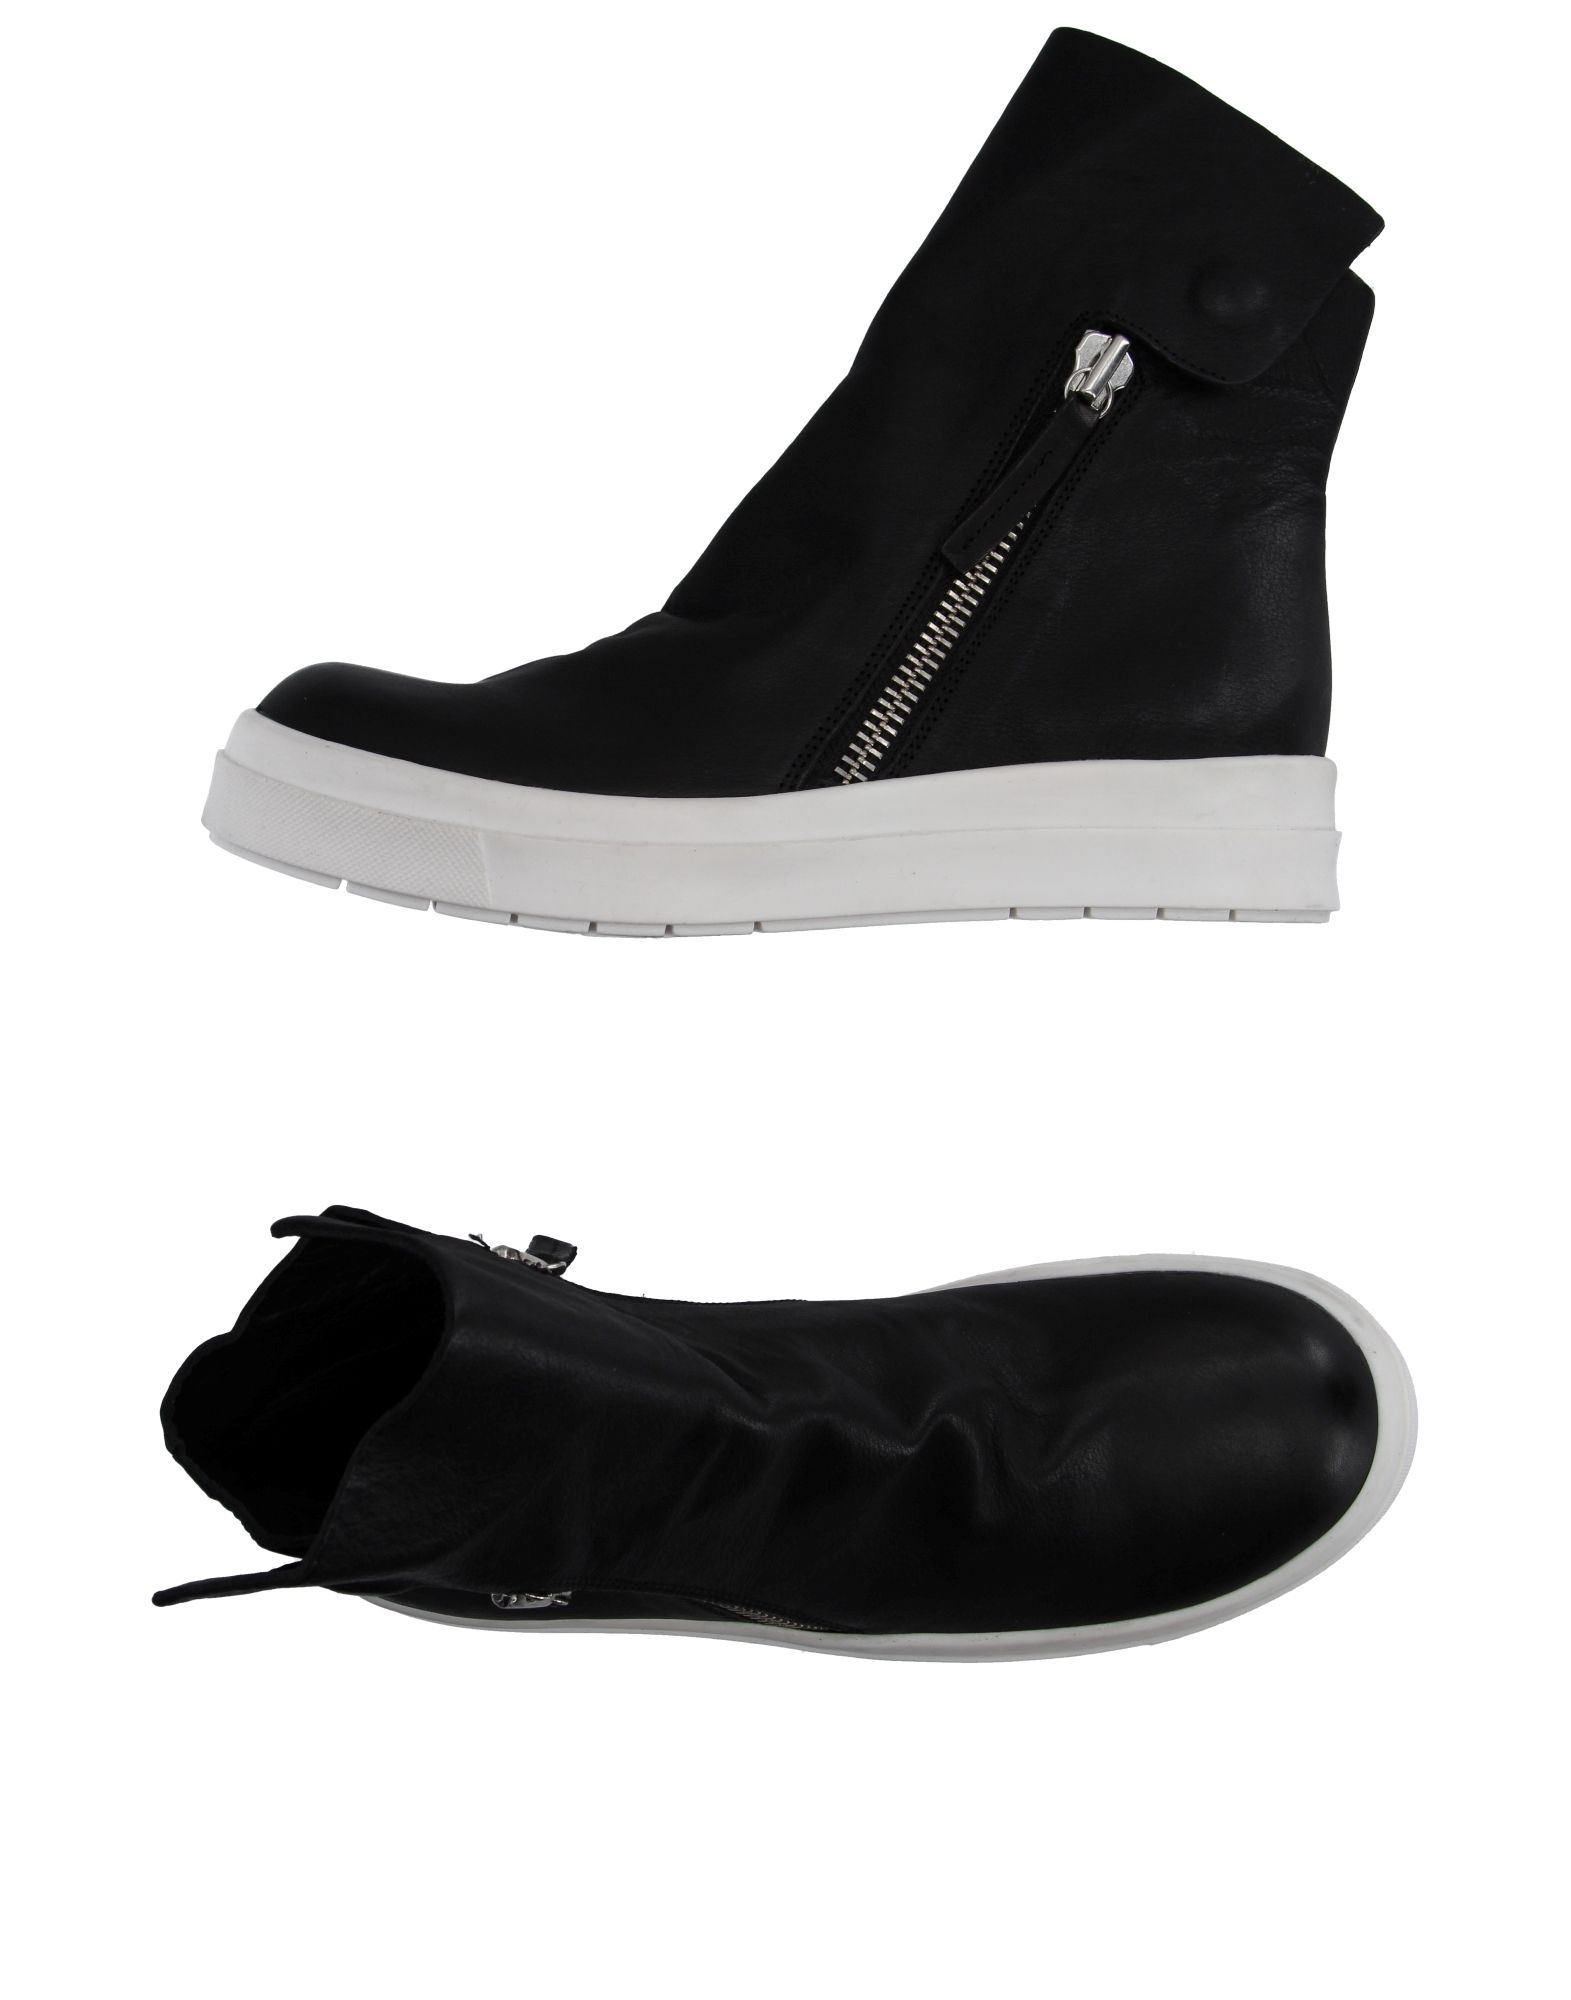 CA by CINZIA ARAIA Высокие кеды и кроссовки ca by cinzia araia высокие кеды и кроссовки